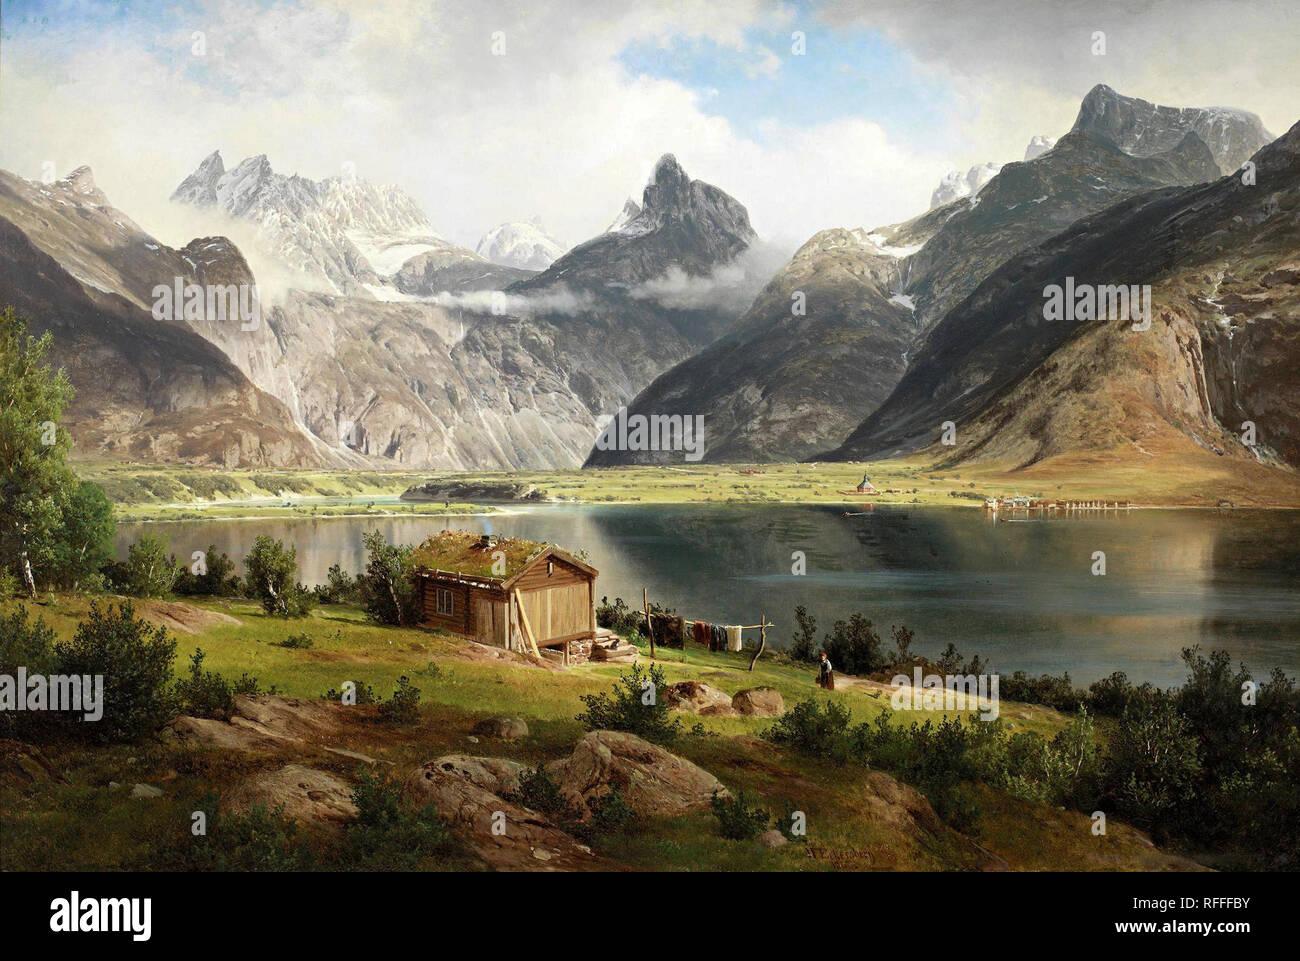 Johan Fredrik Eckersberg – private collection. Title: Fra Romsdalen. Date: 1865. Materials: oil on canvas laid on board. Dimensions: 64 x 95 cm. Source: http://www.goldenkiteforum.com/gallery/files/1/9/8/7/7/johan_fredrik_eckersberg_1822-1870_-fra_romsdalen.jpg. - Stock Image